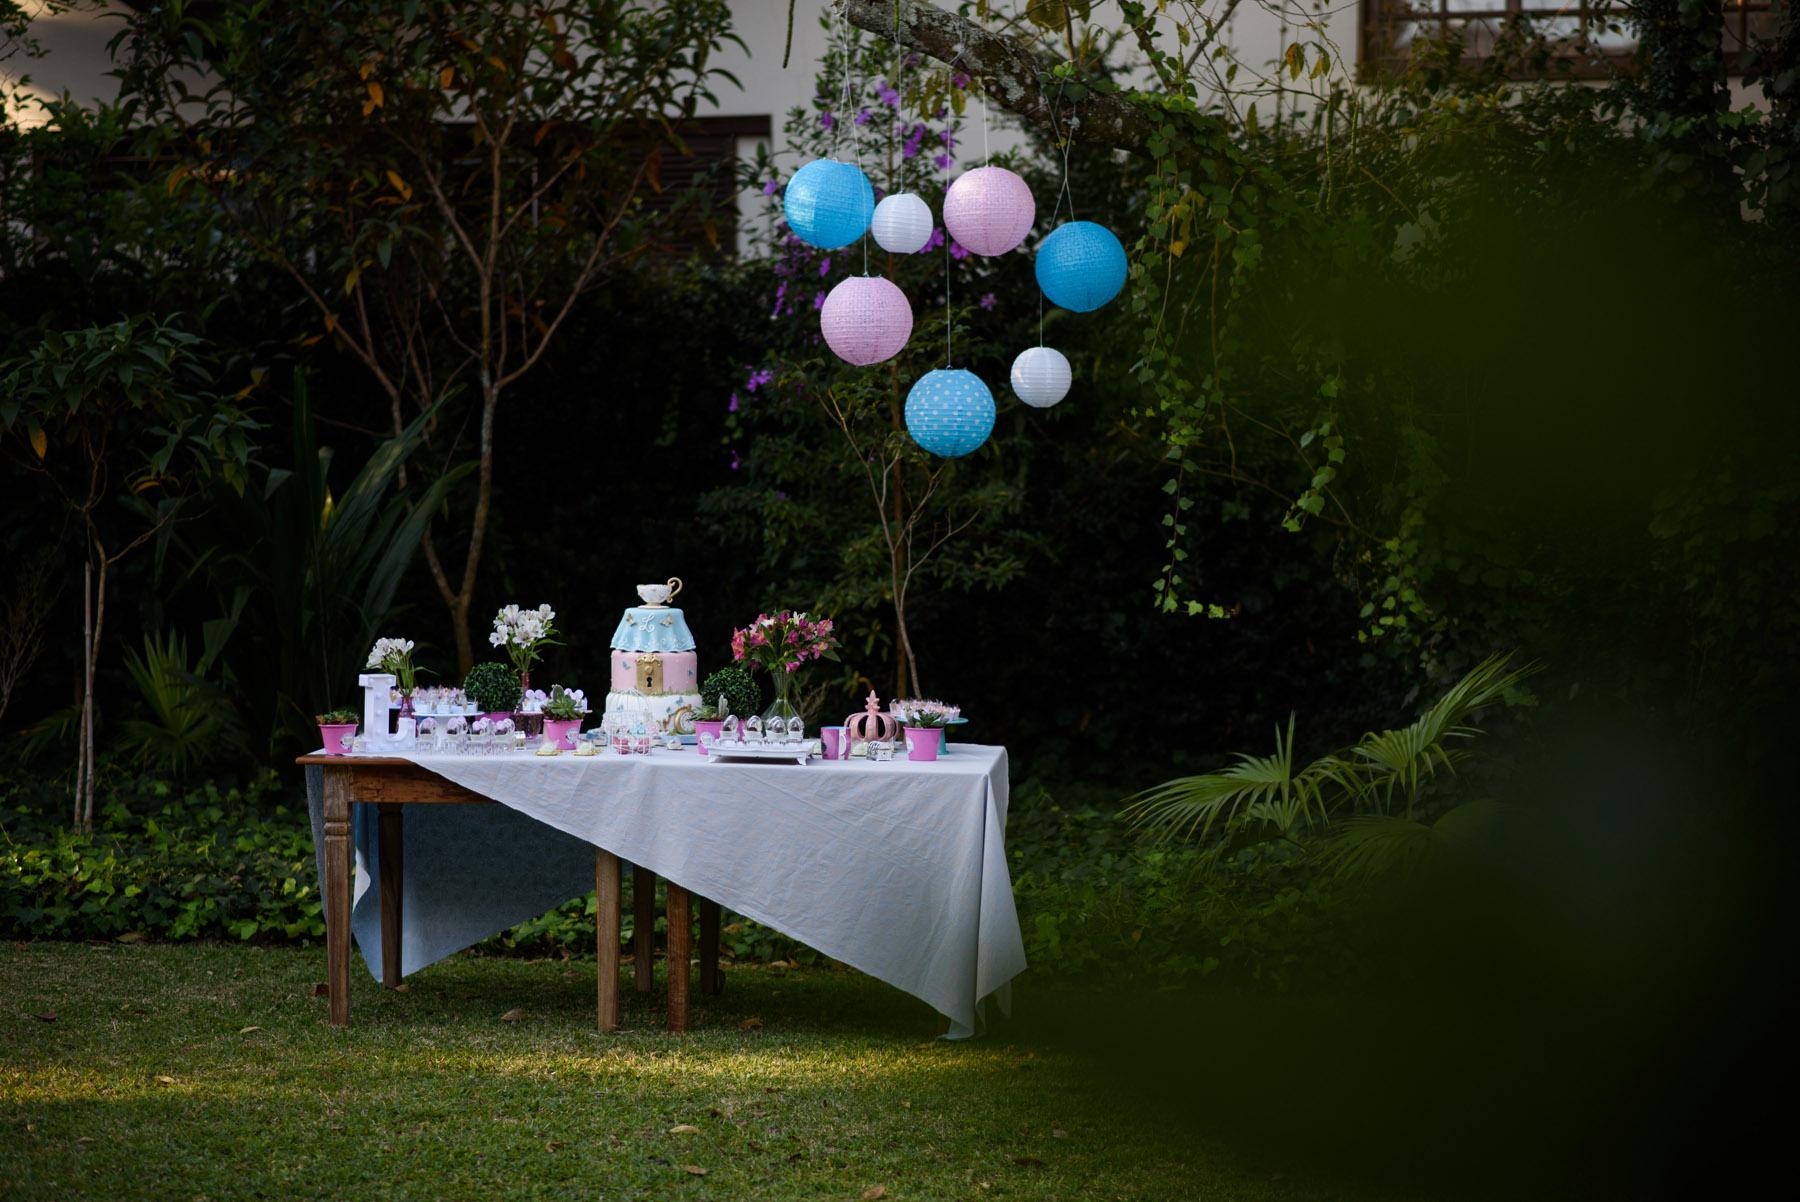 02-aniversario-infantil-curitiba-fotografo-infantil-festa-infantil-curitiba-alice.jpg